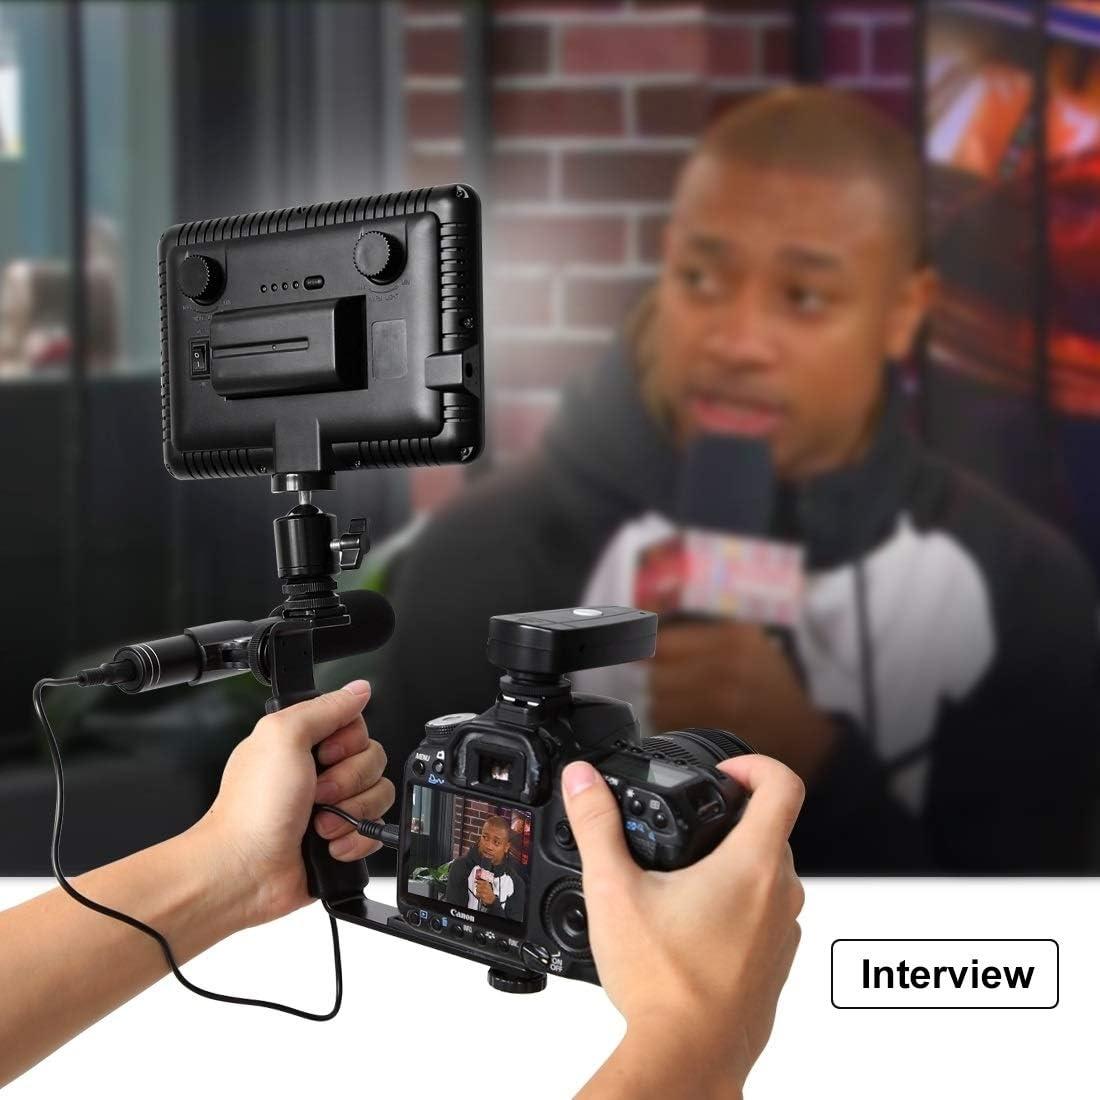 Protective Case for Sports Camera L-Shape Bracket Handheld Grip Holder with Dual Side Cold Shoe Mounts for Video Light Flash DSLR Camera